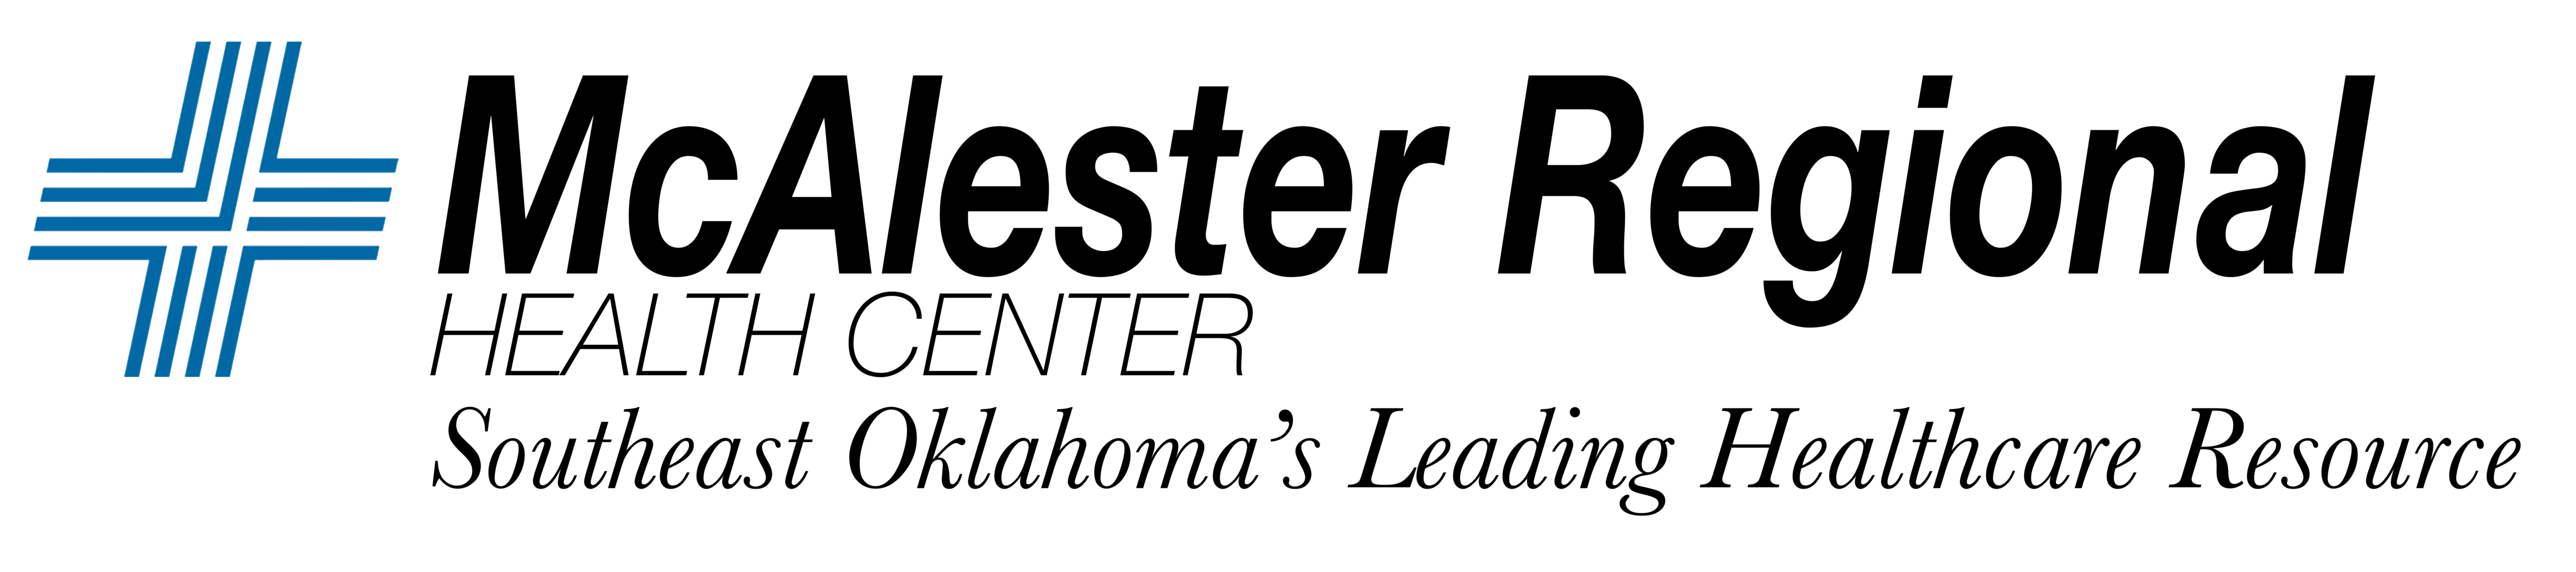 McAlester Regional Health Center logo